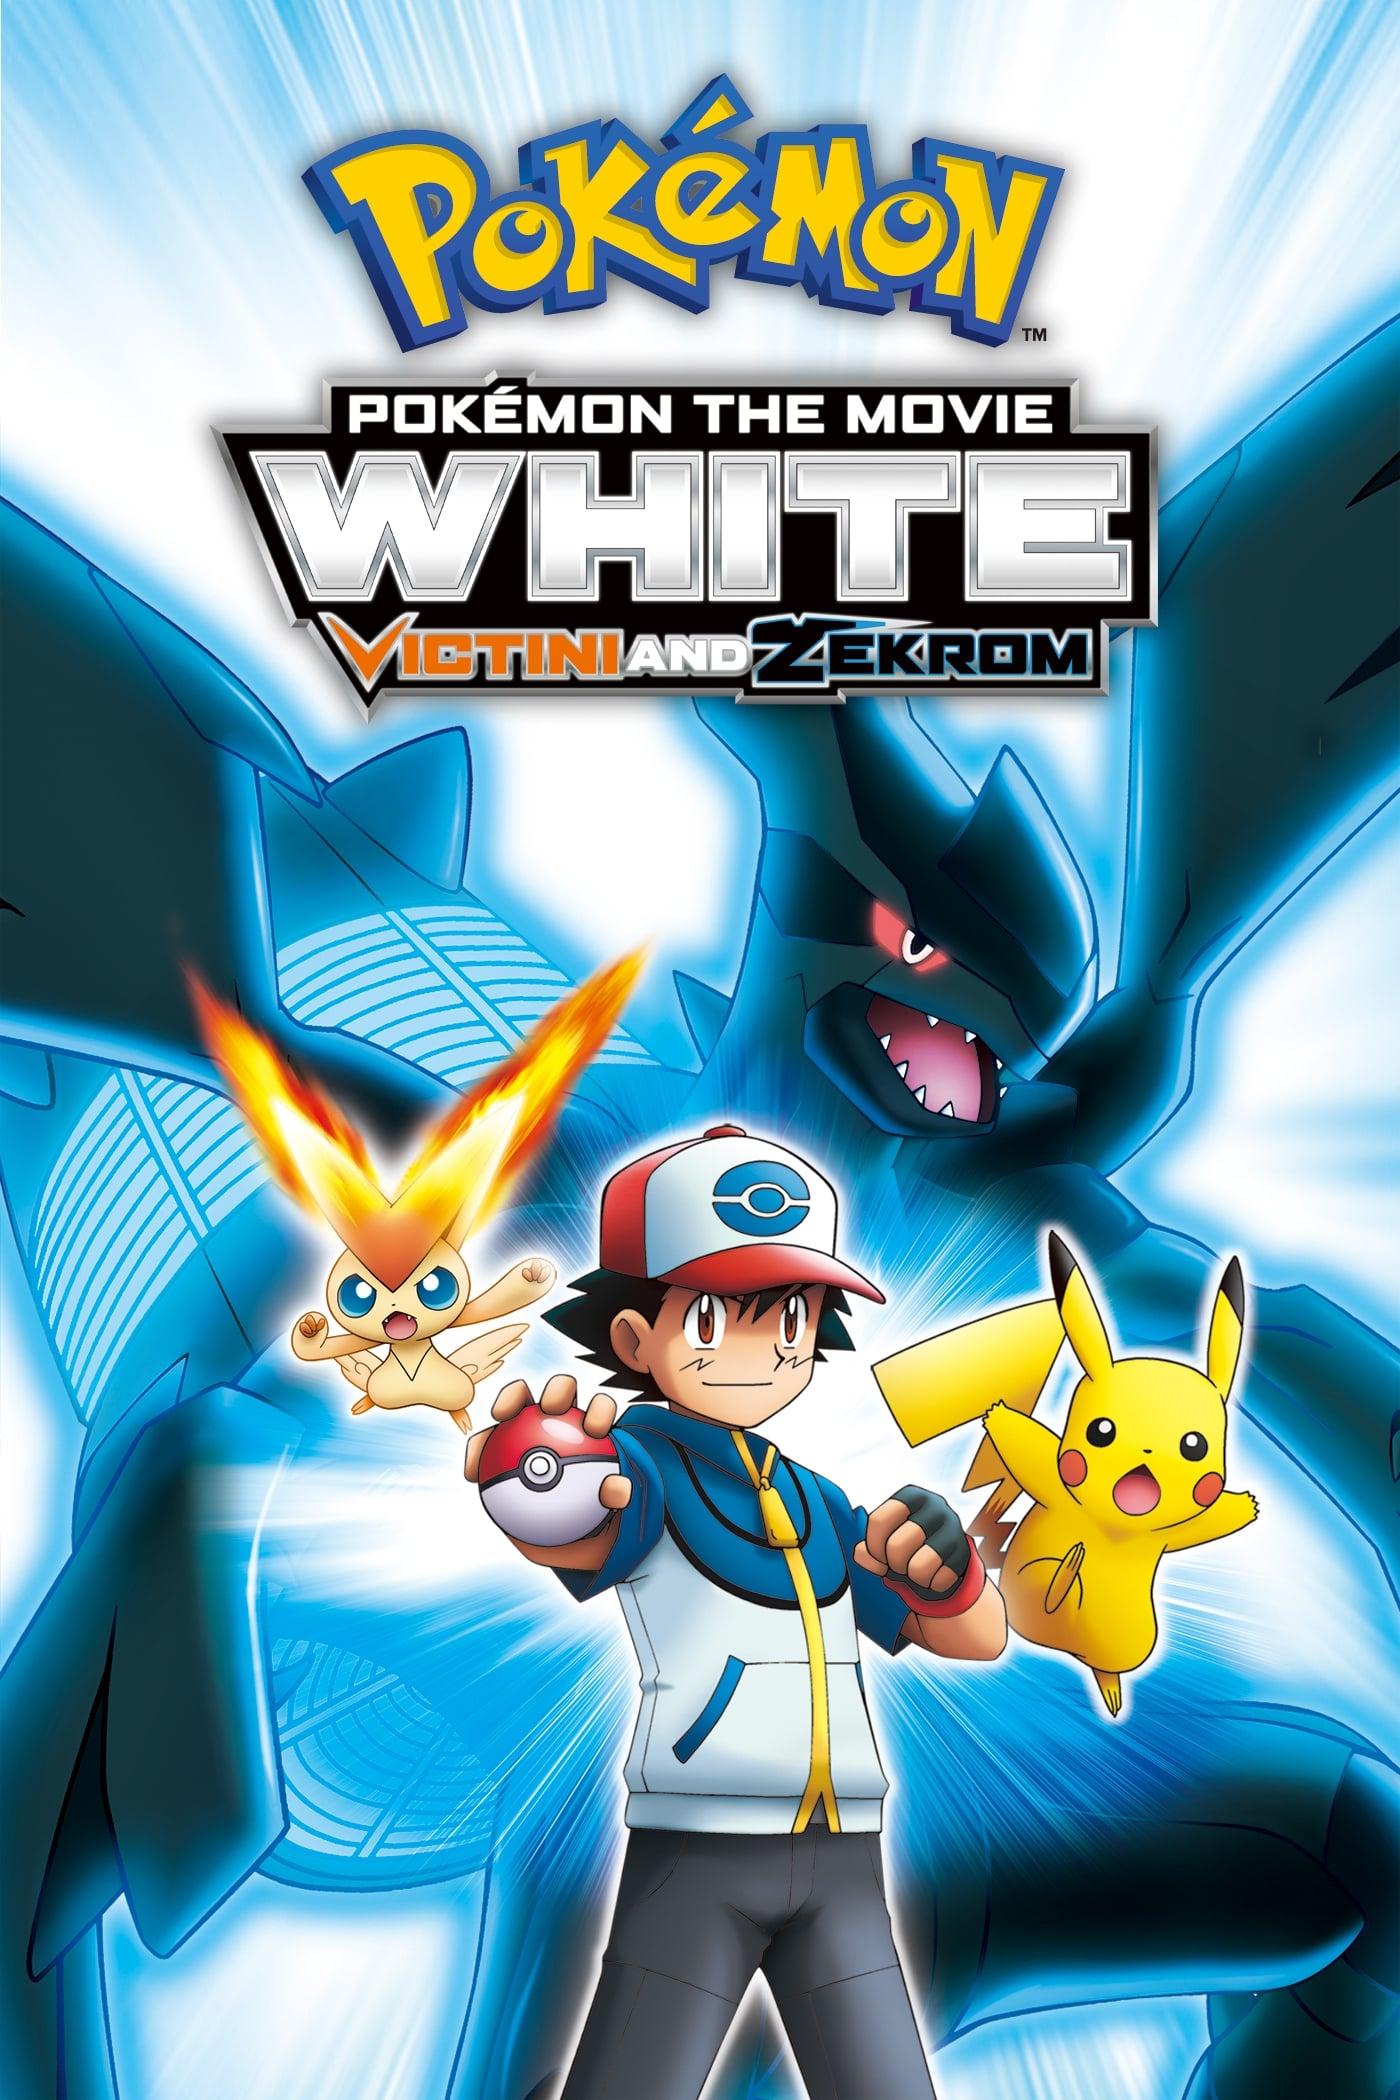 Pokémon the Movie: White - Victini and Zekrom